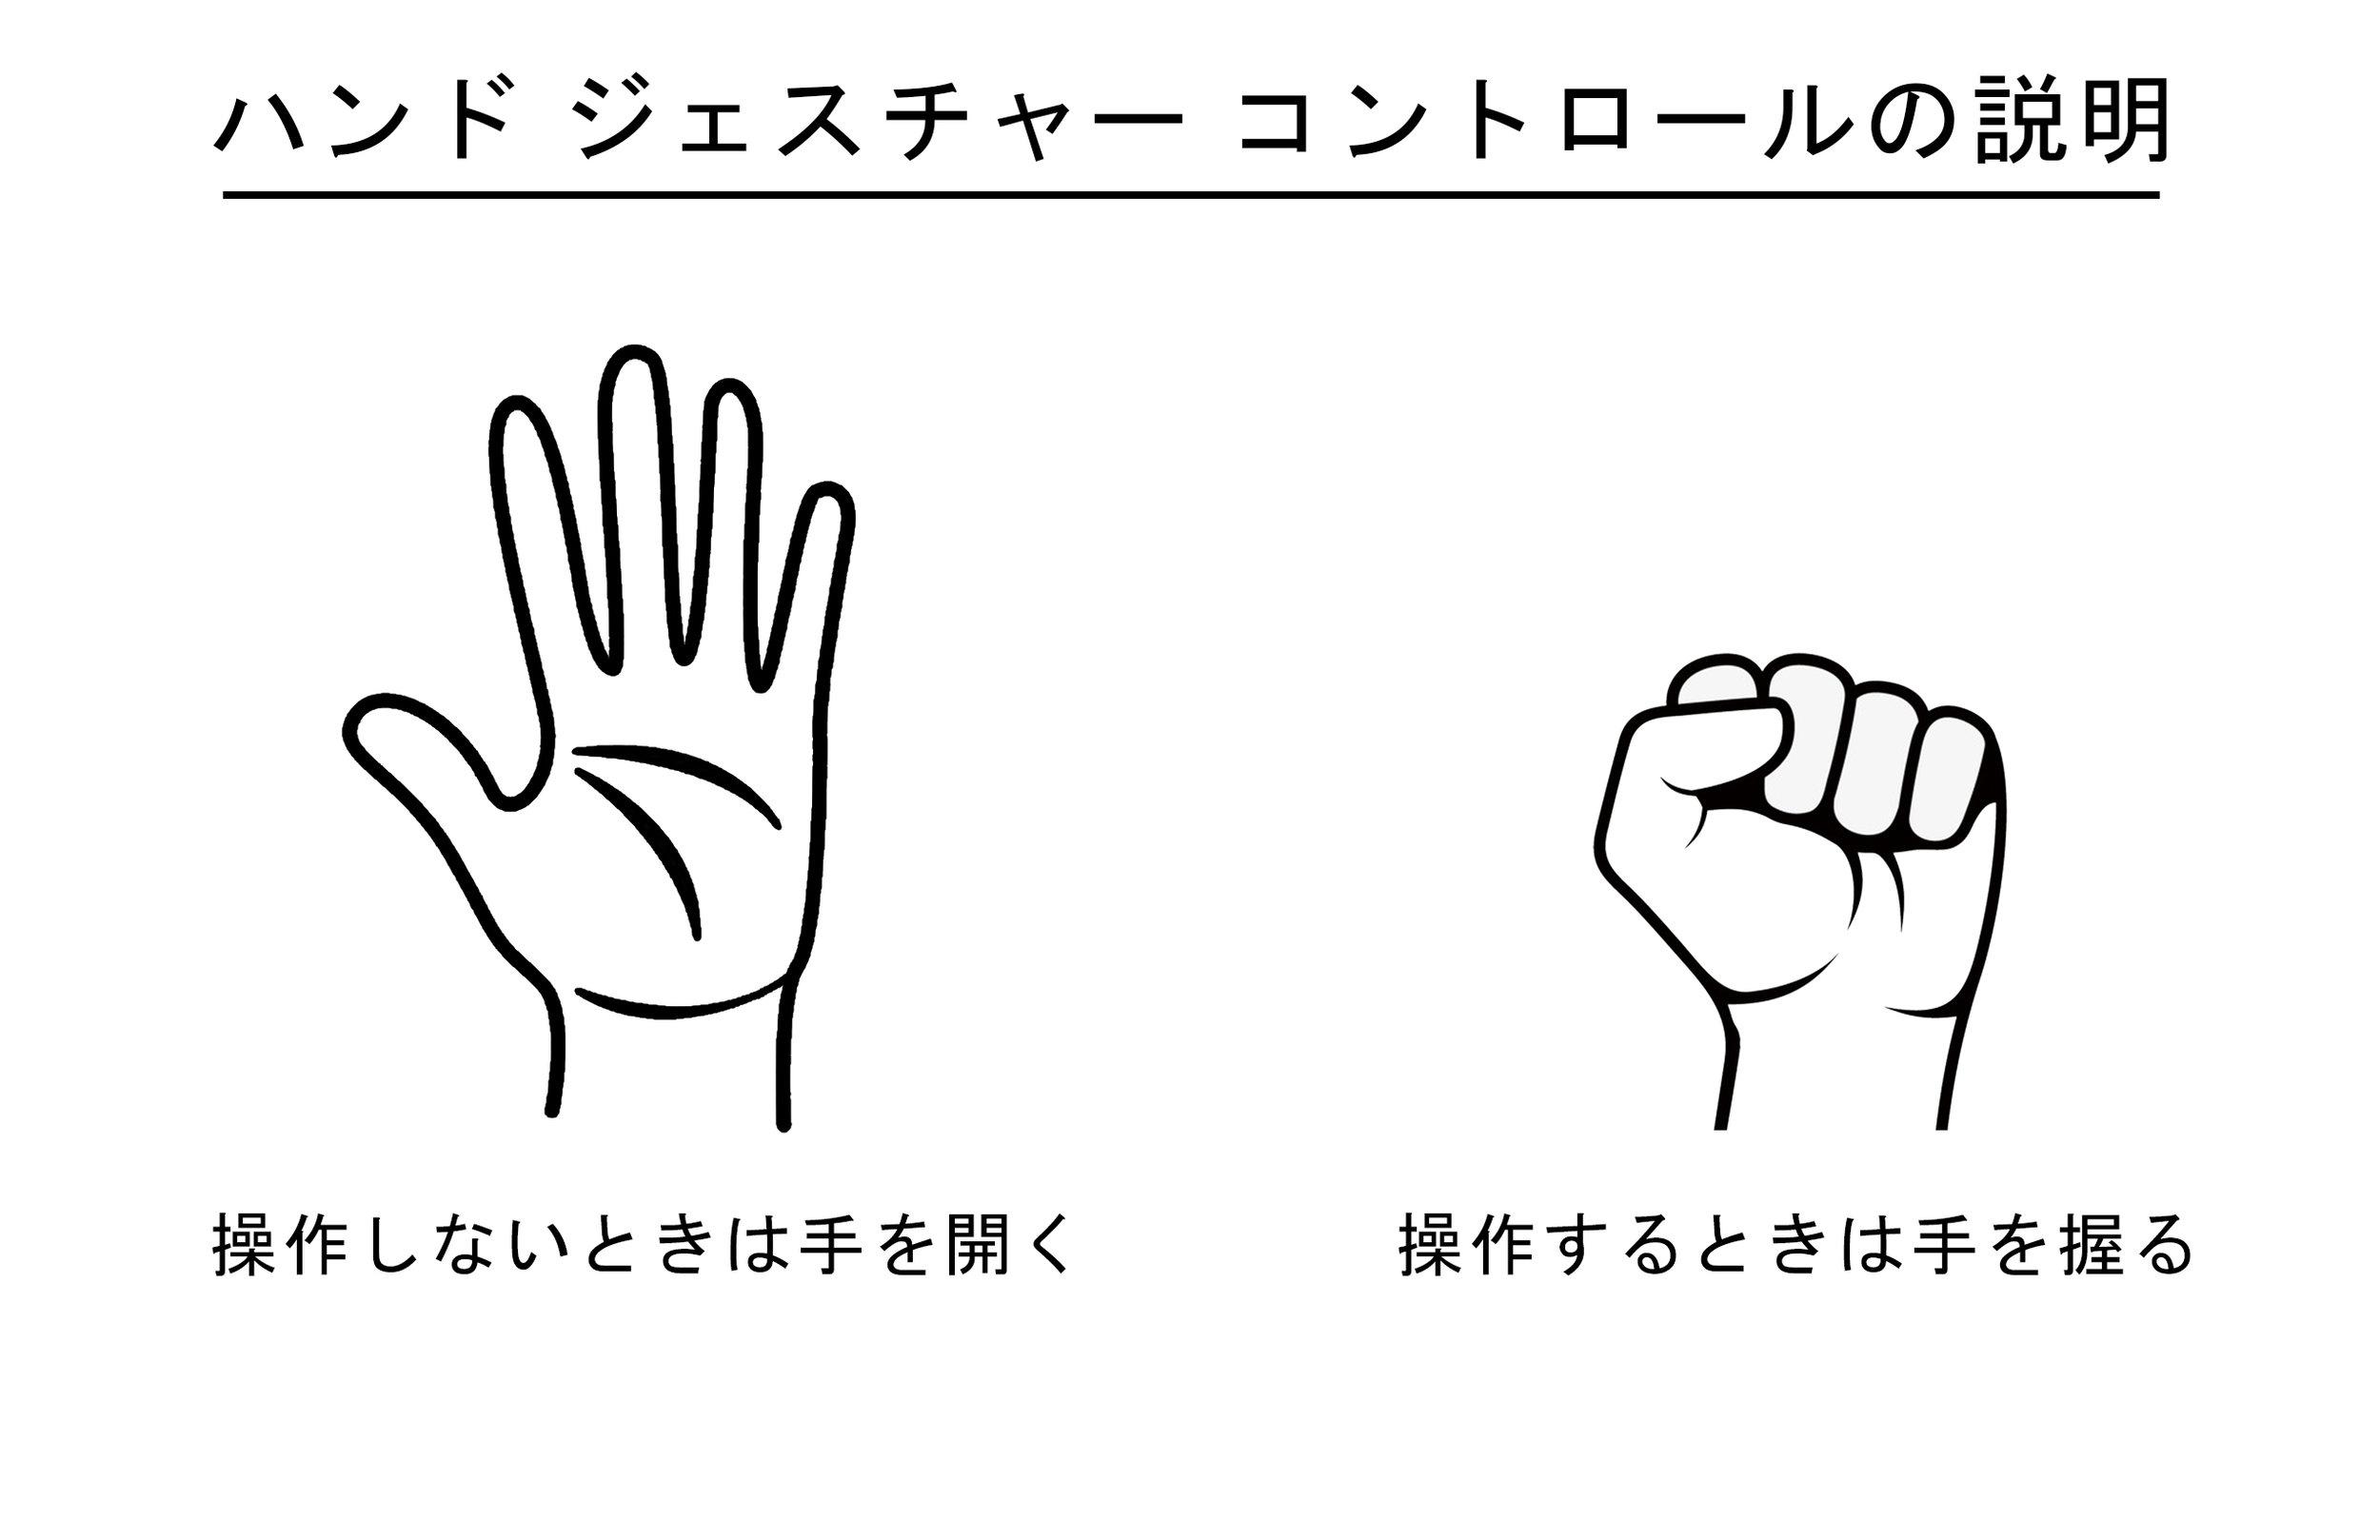 Hand Gesture Controls - Japanese.jpg